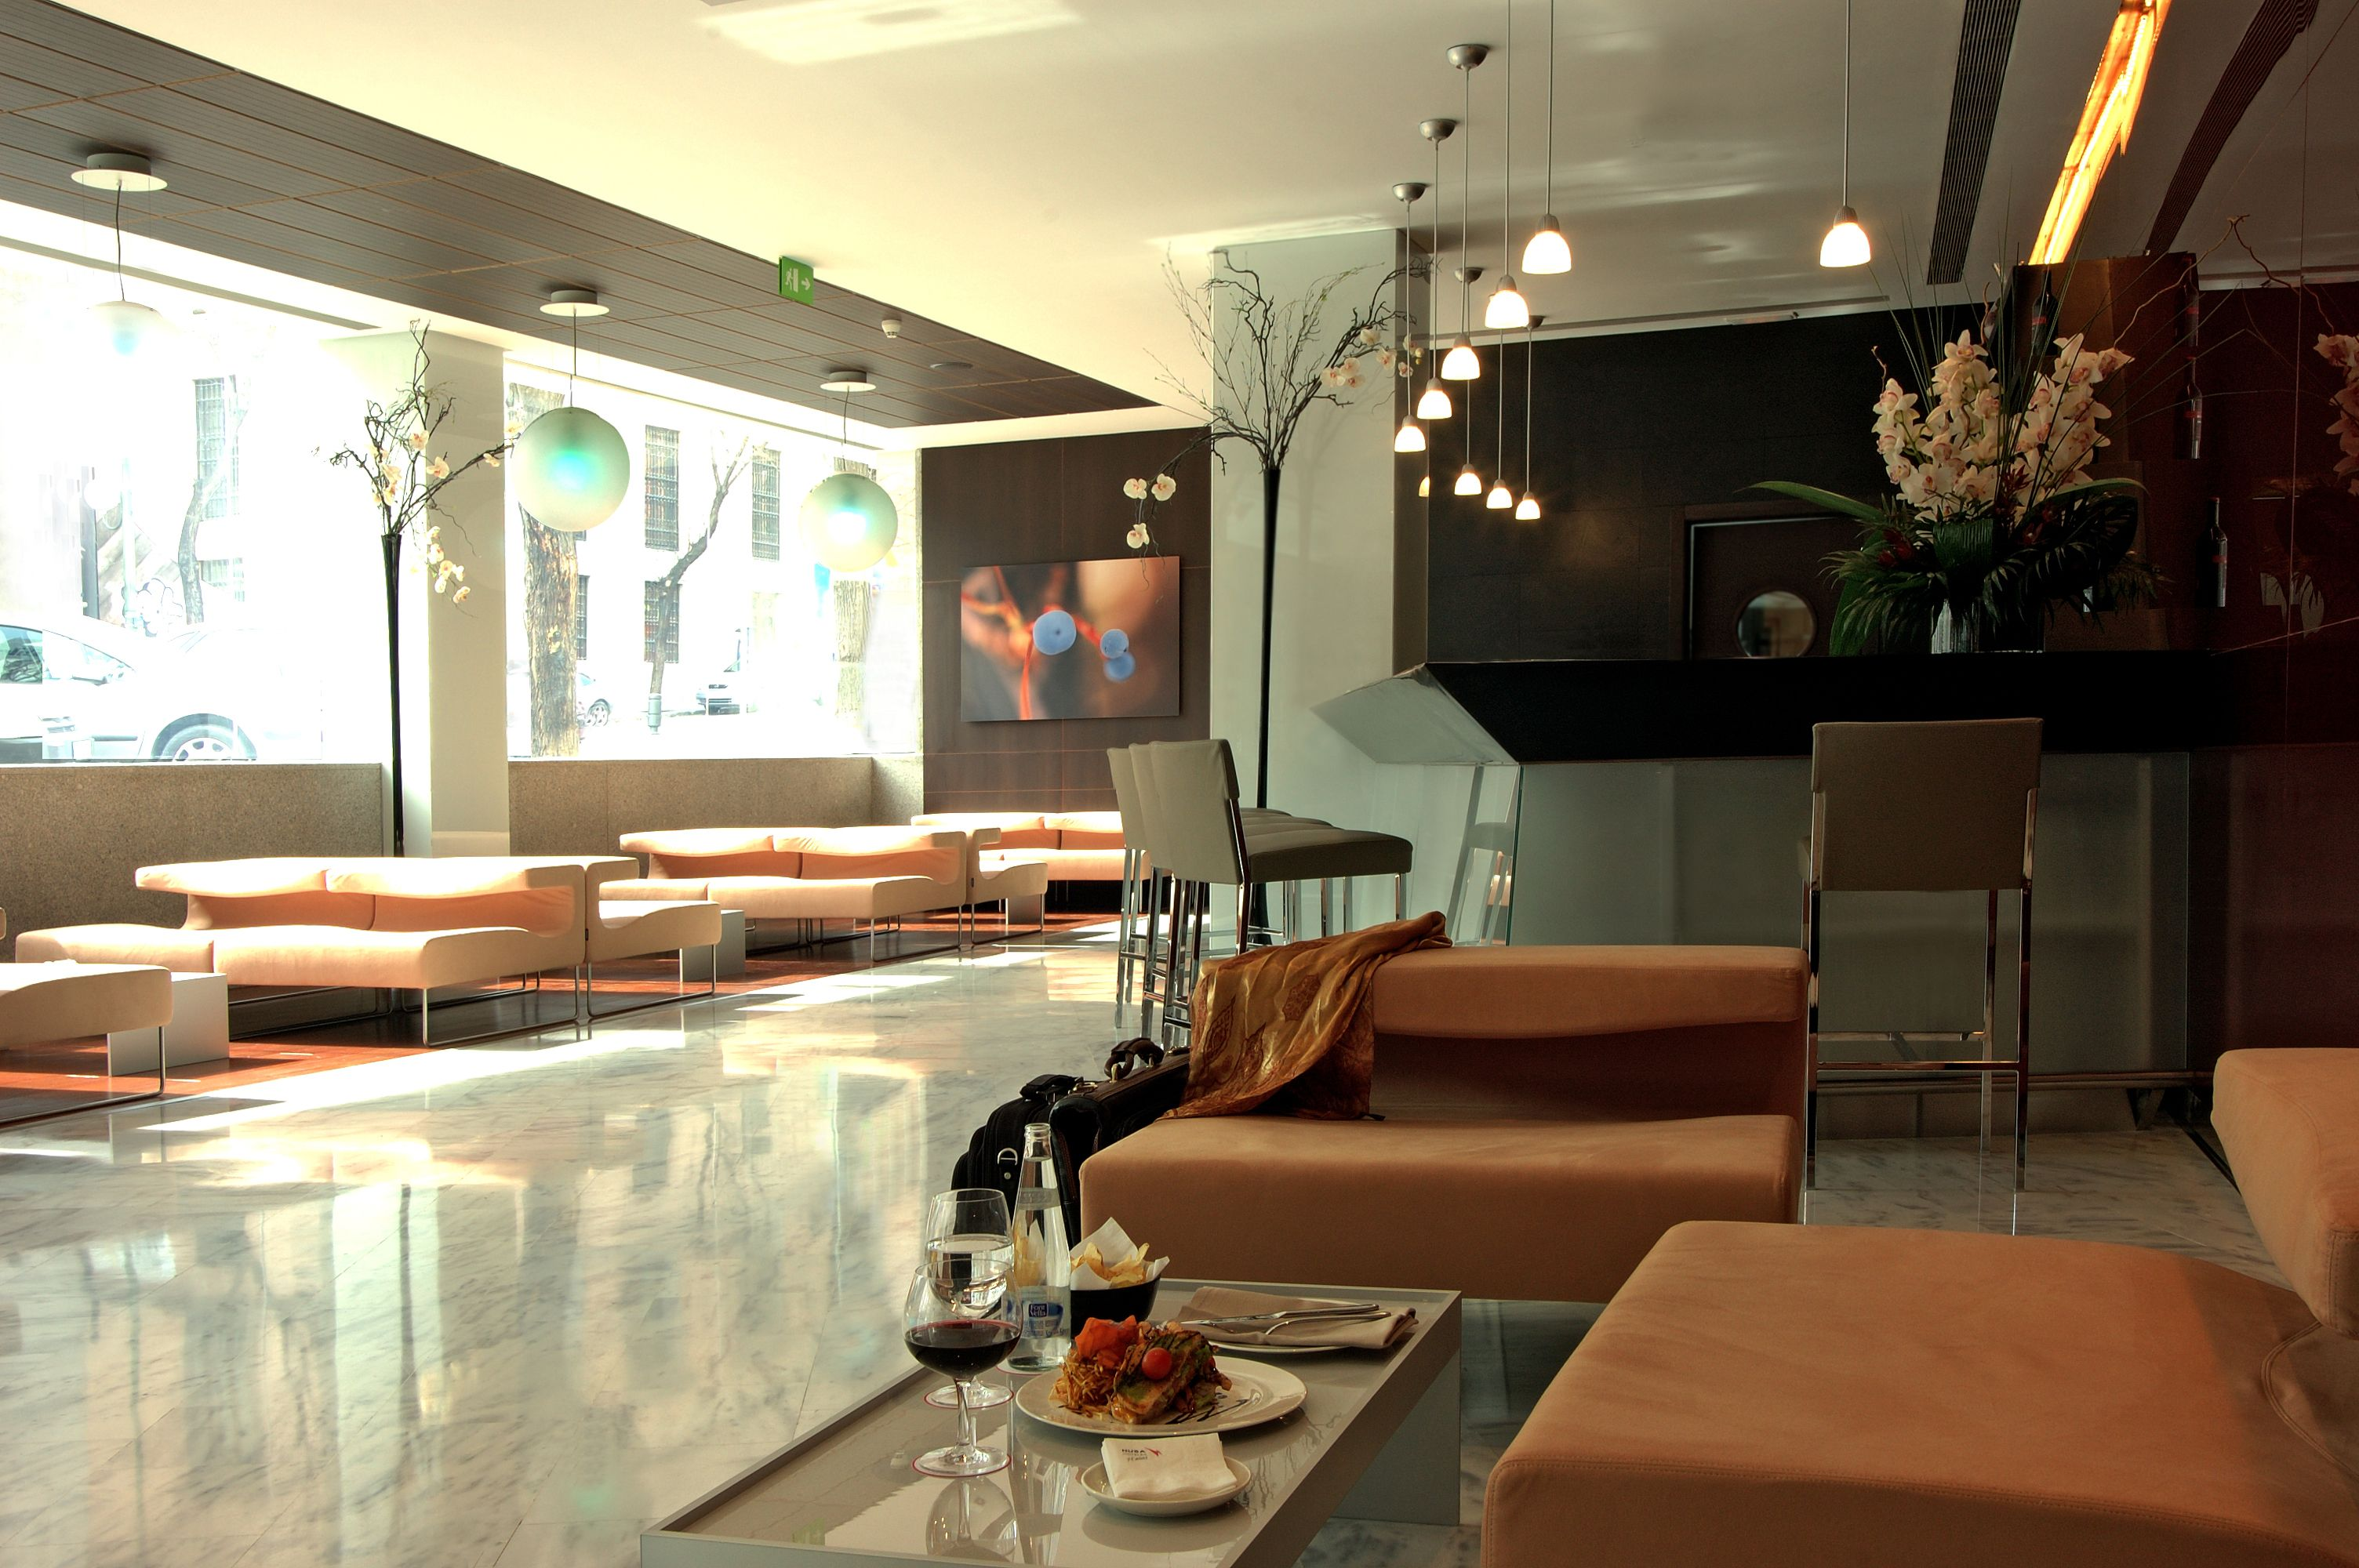 Hotel HUSA Paseo del Arte, lobby bar. allende arquitectos. Madrid 2004